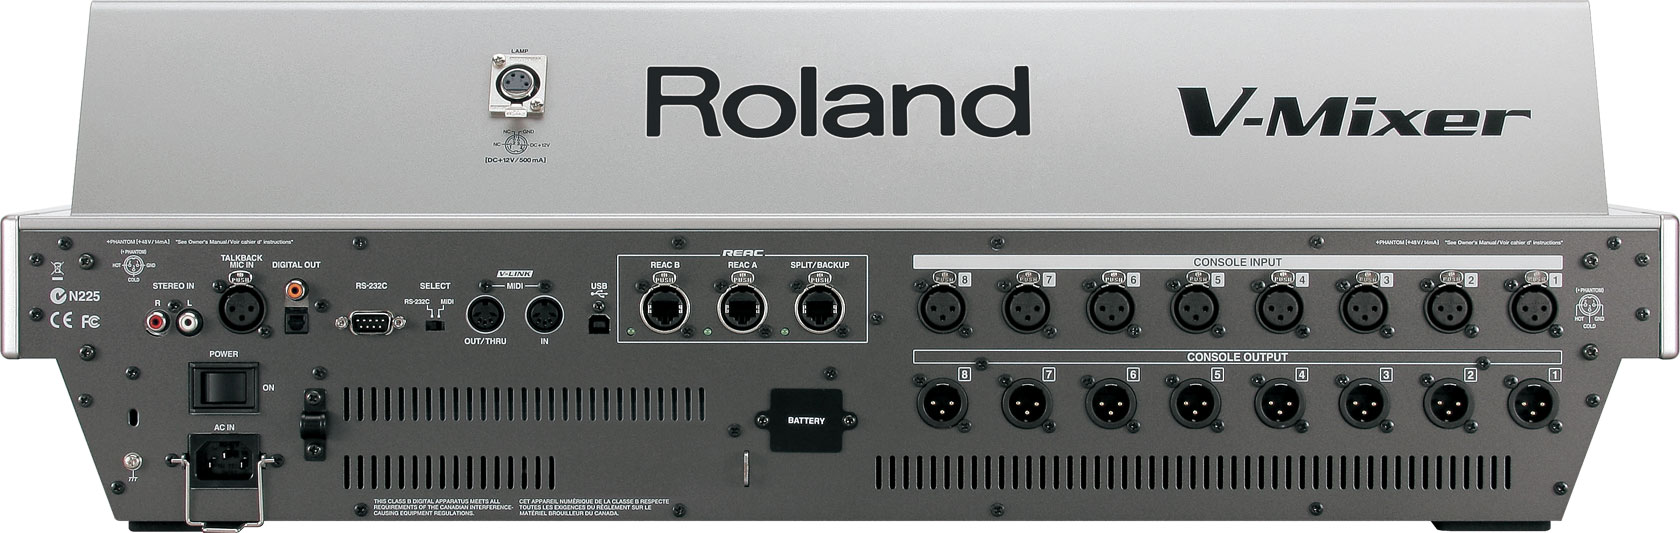 M400 ROLAND DRIVER (2019)